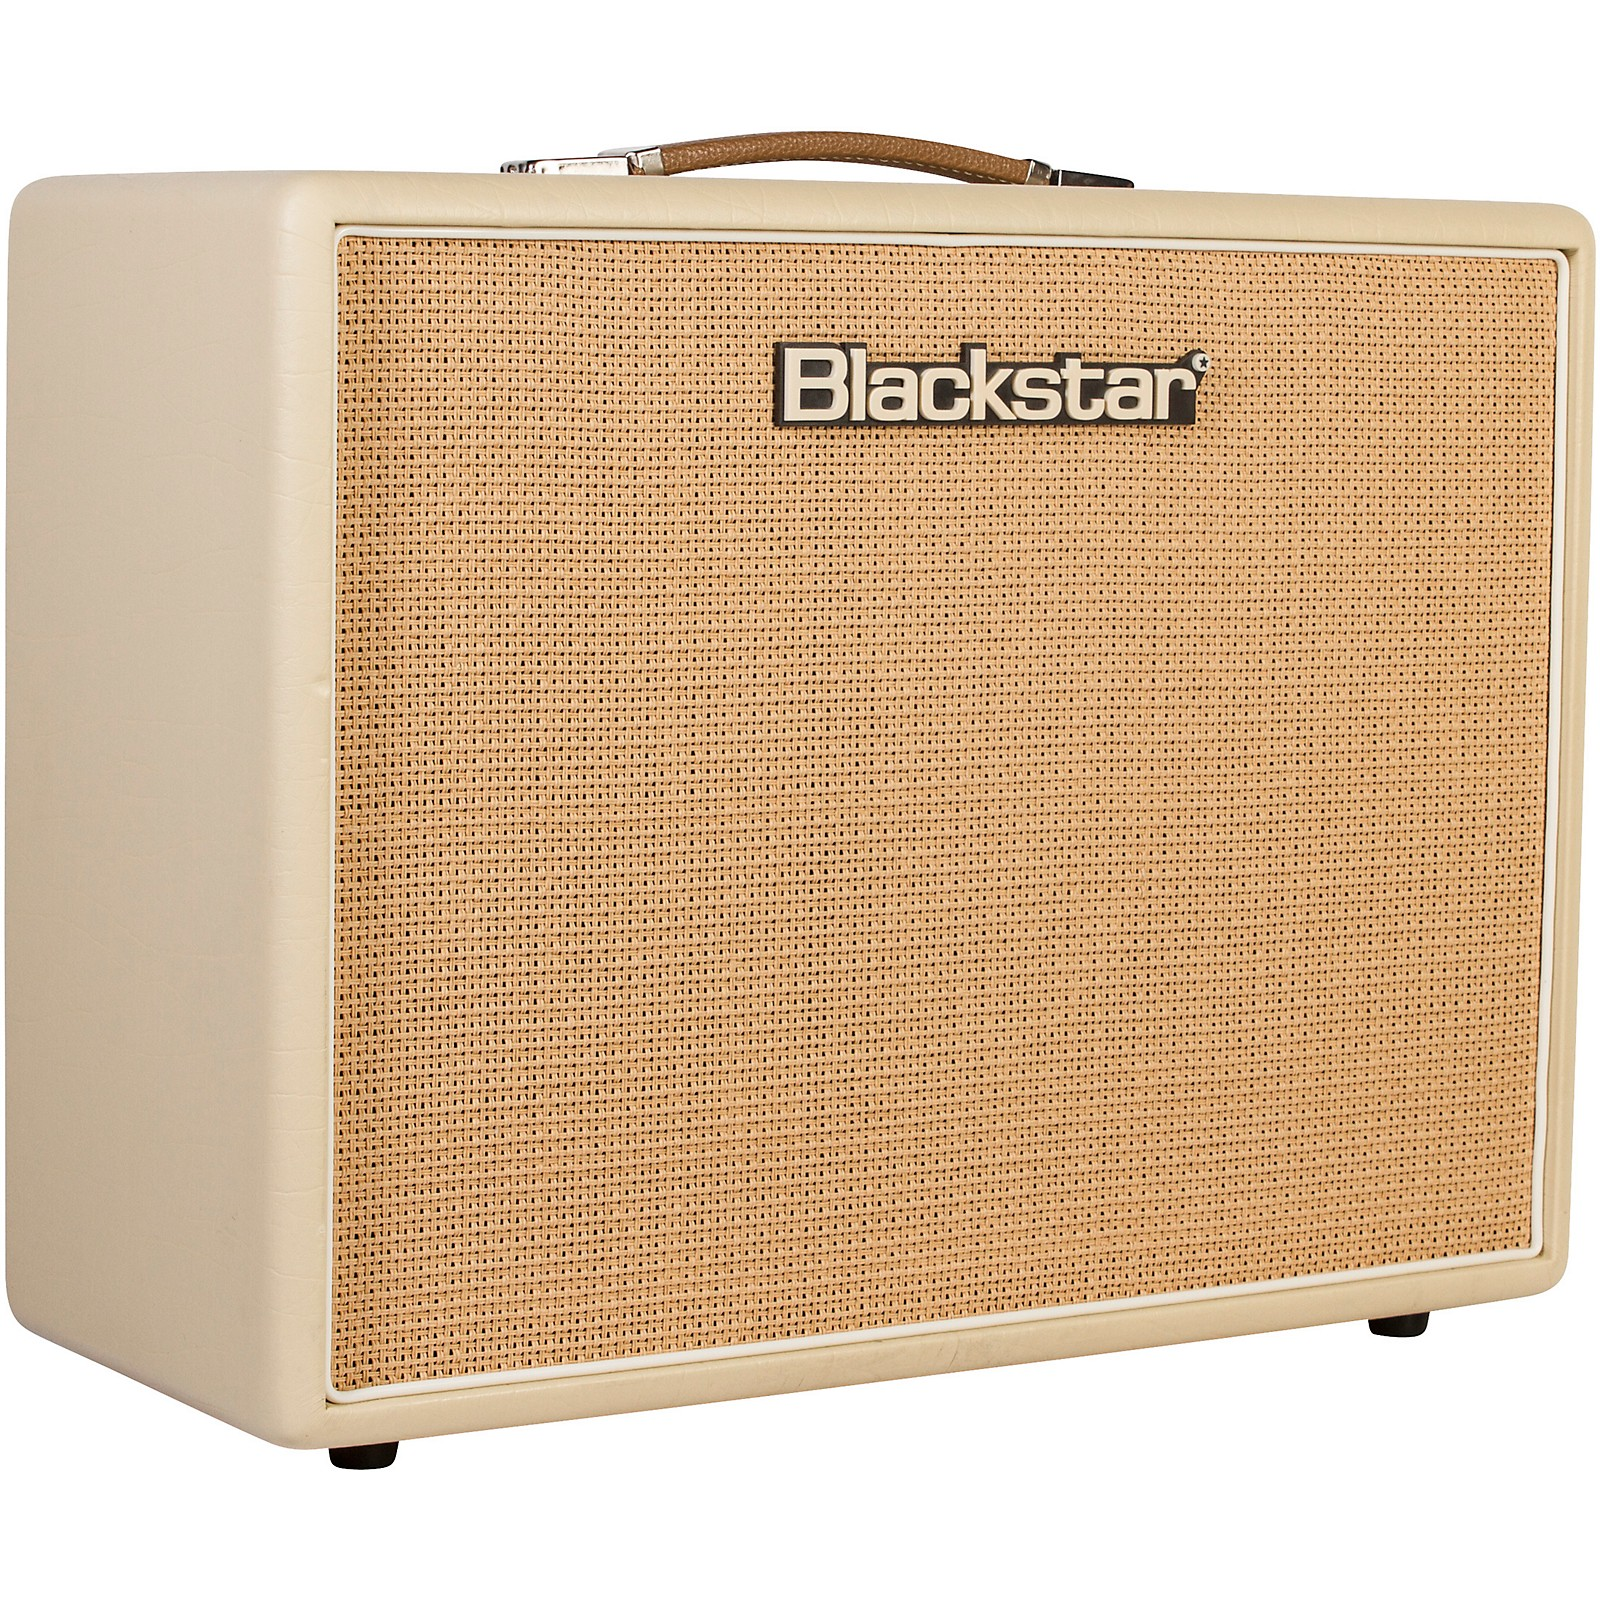 Open Box Blackstar Artist 15 Special 15W 1x12 Tube Guitar Combo Amp